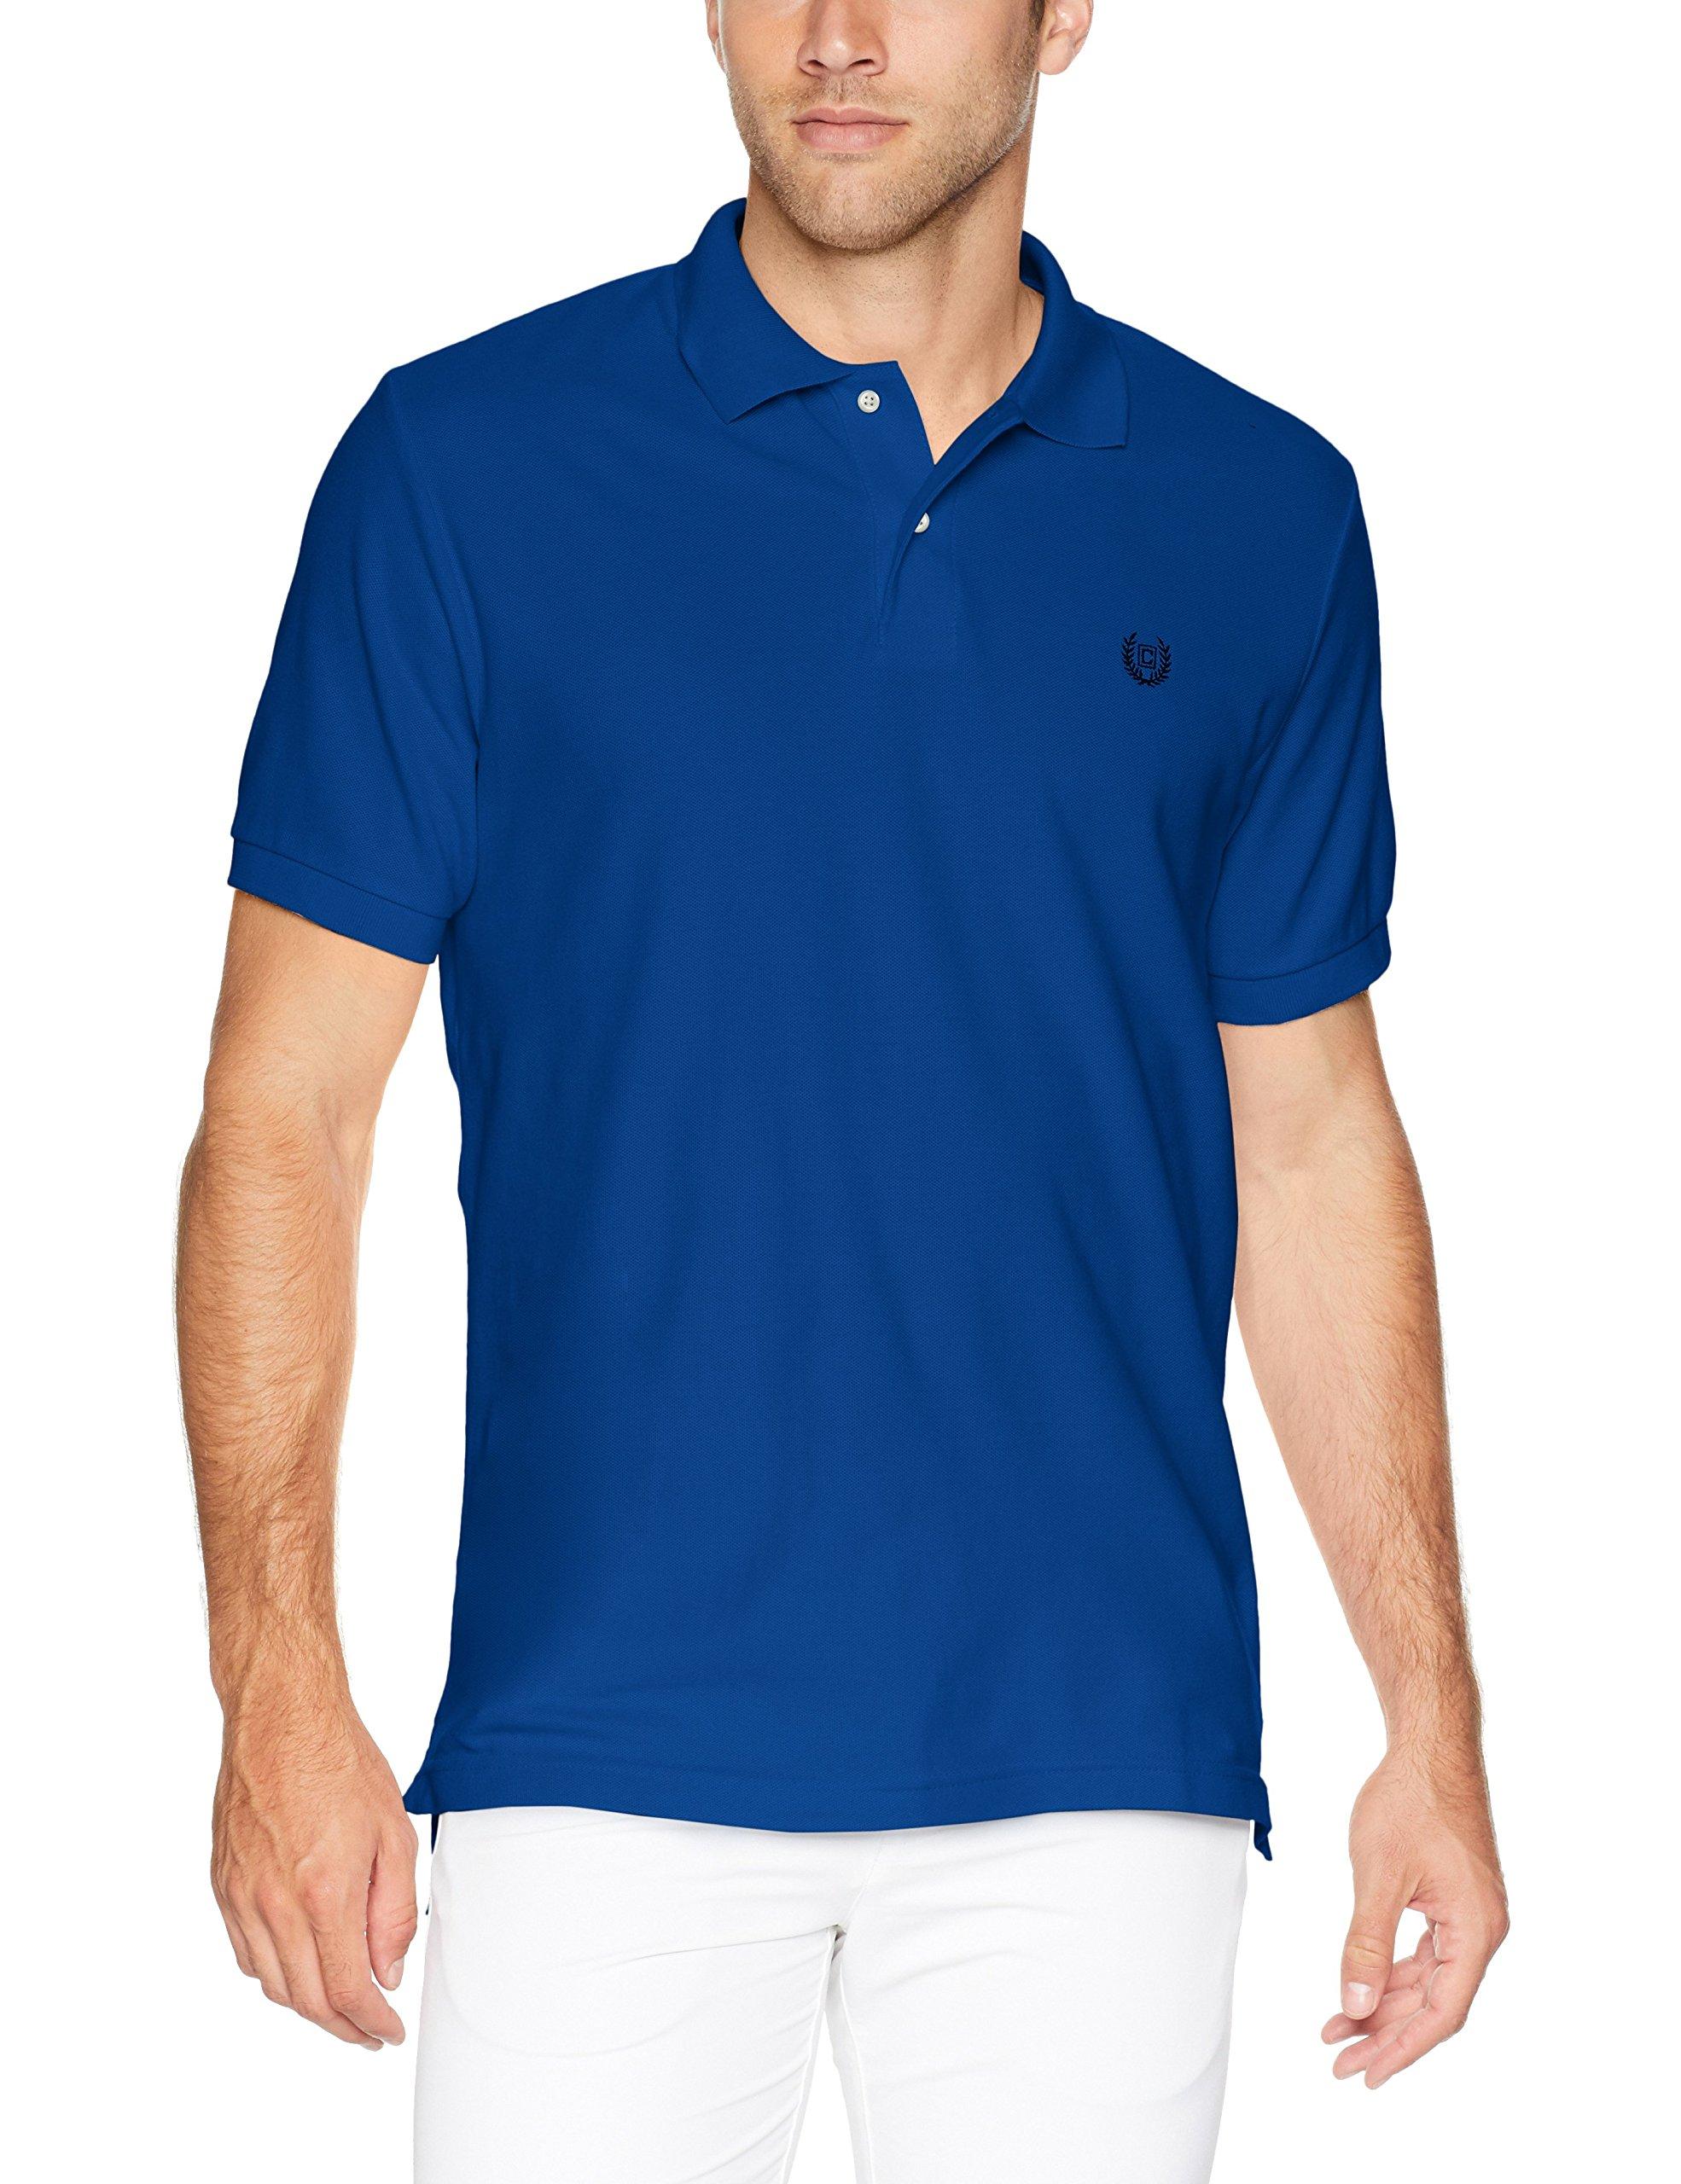 Chaps Mens Classic Fit Printed Cotton Mesh Polo Shirt